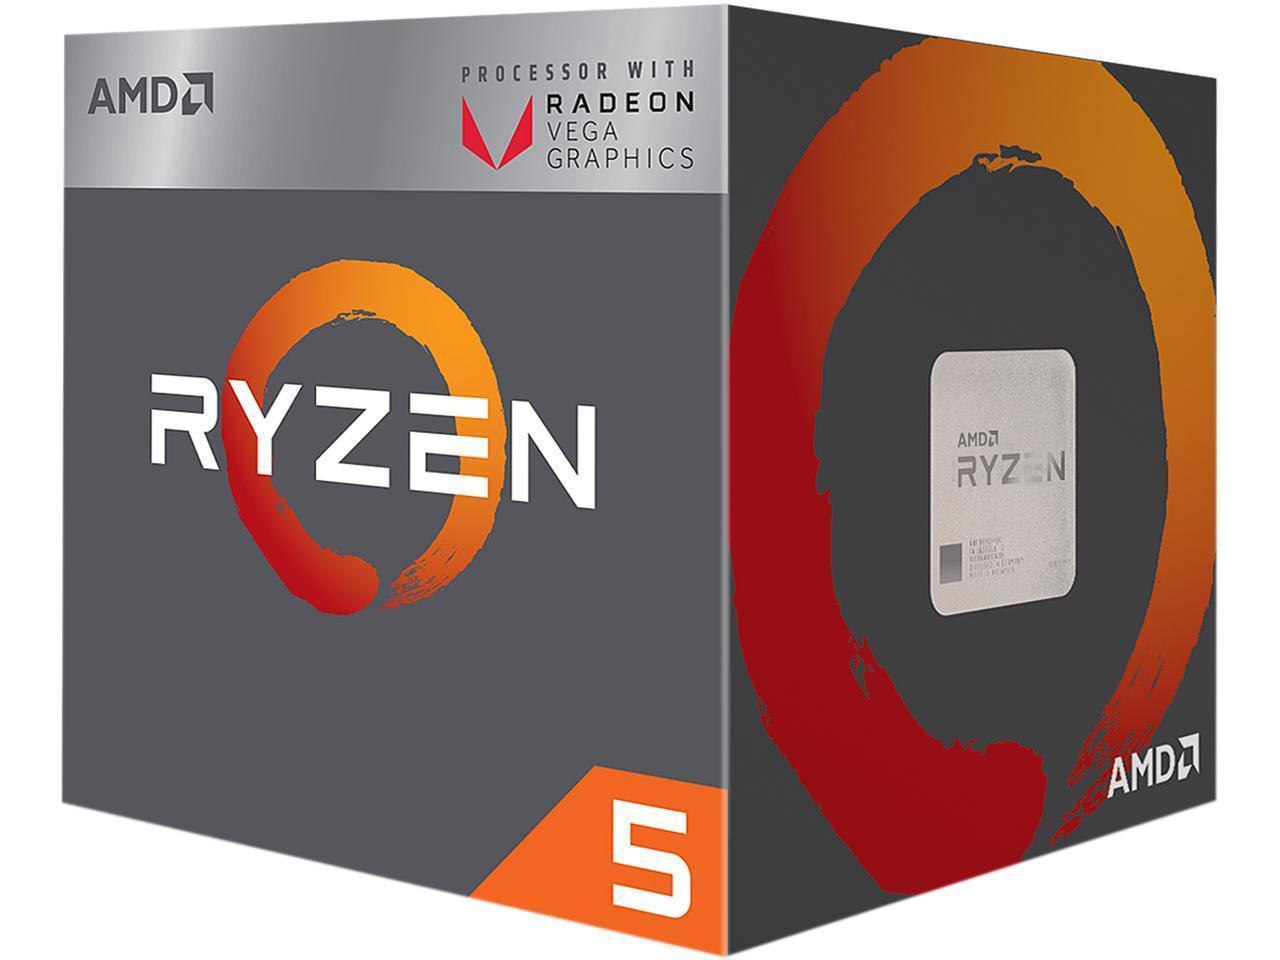 Процесор AMD RYZEN 5 2400G 4-Core 3.6 GHz (3.9 GHz Turbo) 6MB/65W/AM4, BOX